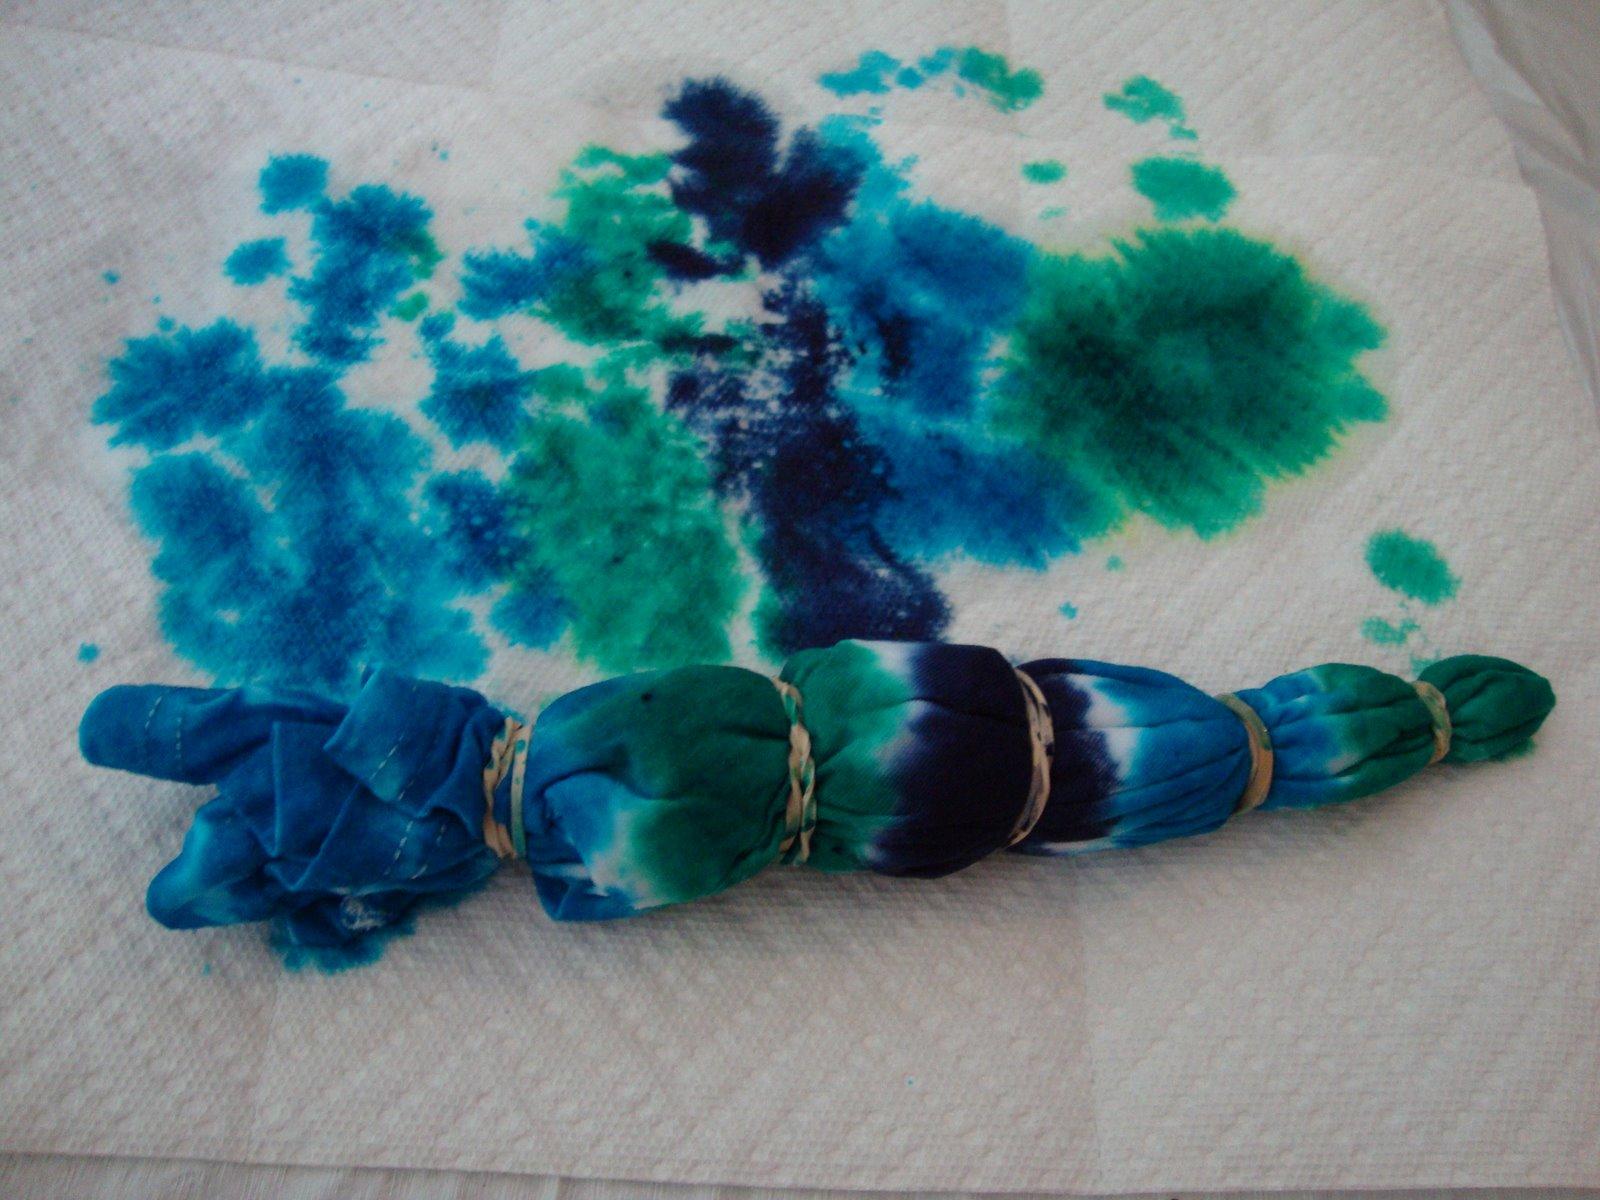 Tie dye shirts deep fried kudzu for How to make tie dye shirts at home